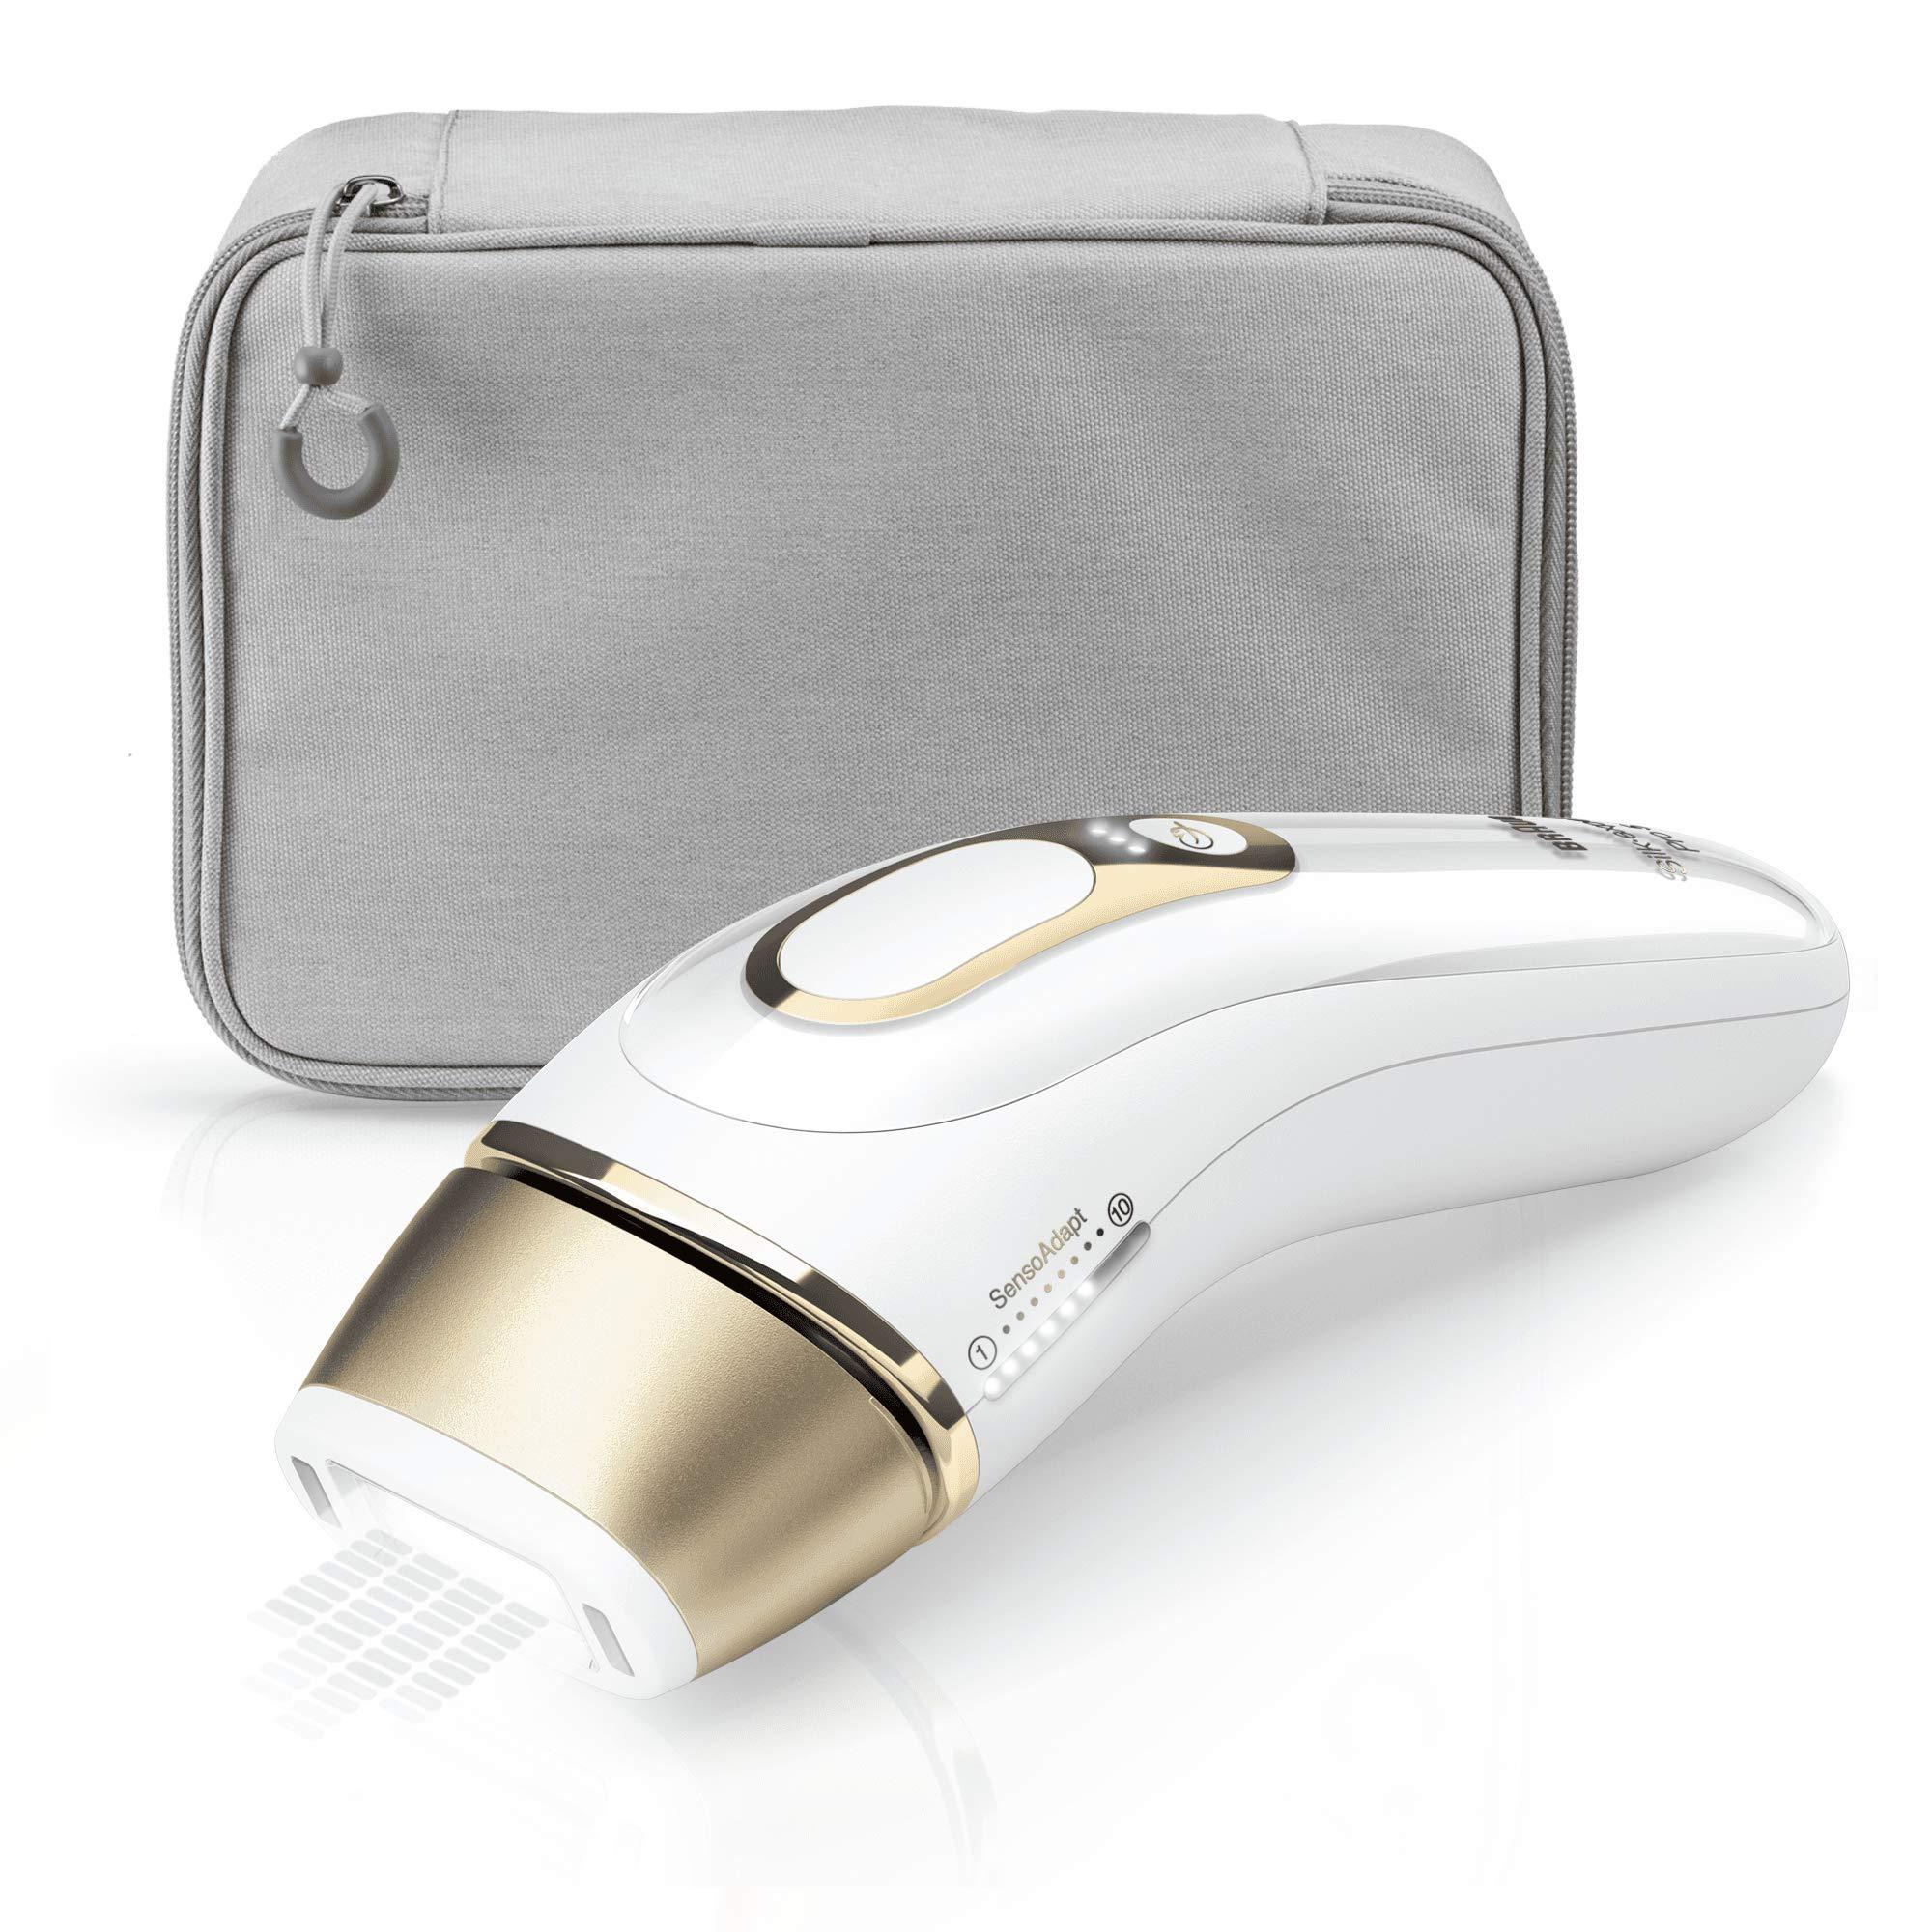 Braun Ipl Silk Expert Pro 5 Pl5014 Generation Ipl Permanent